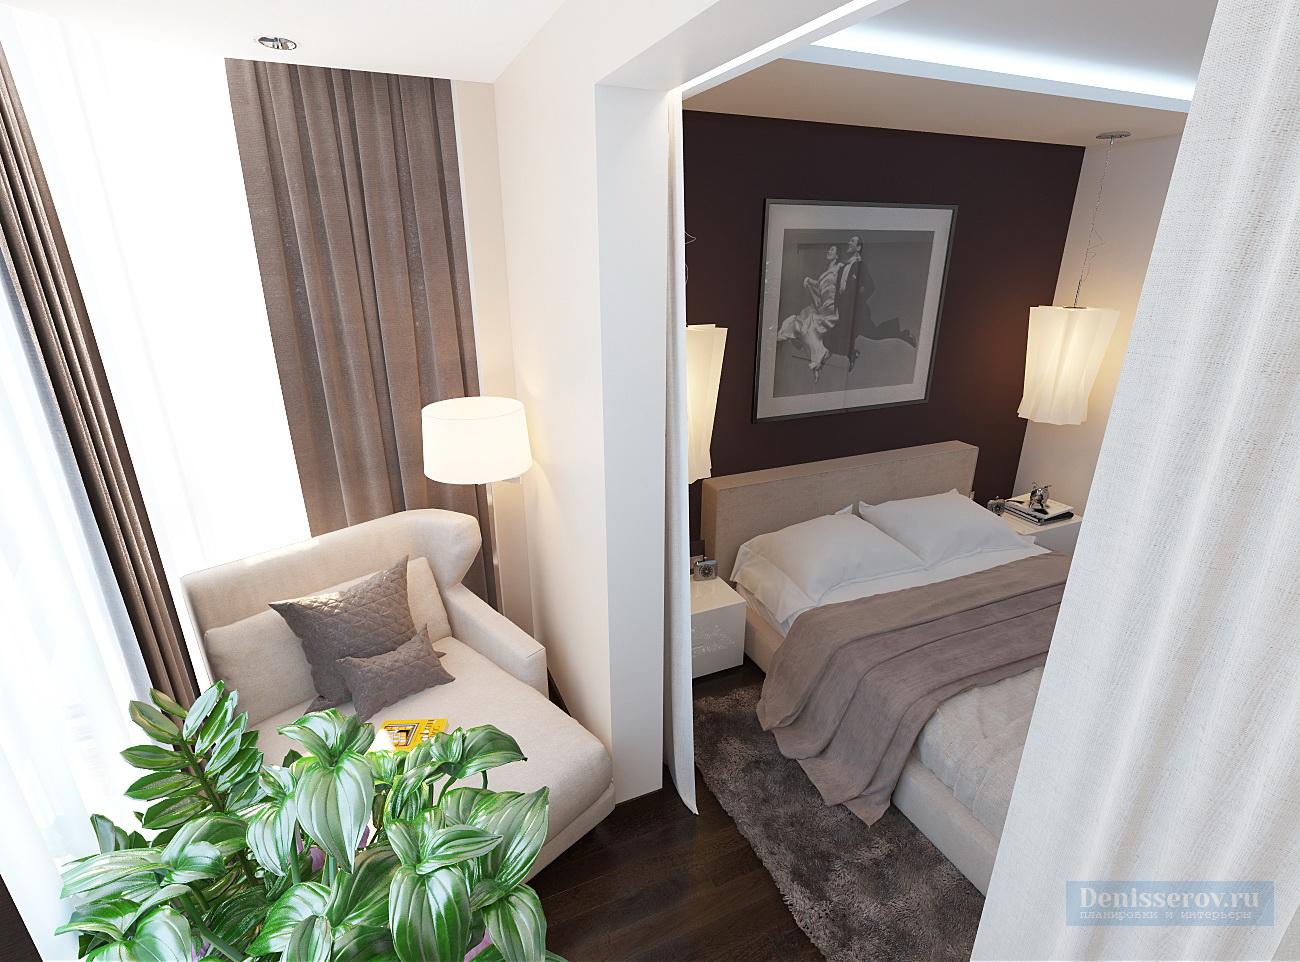 Proekt-dizajn-spalni-17-kv-m-v-stile-minimalizm-3